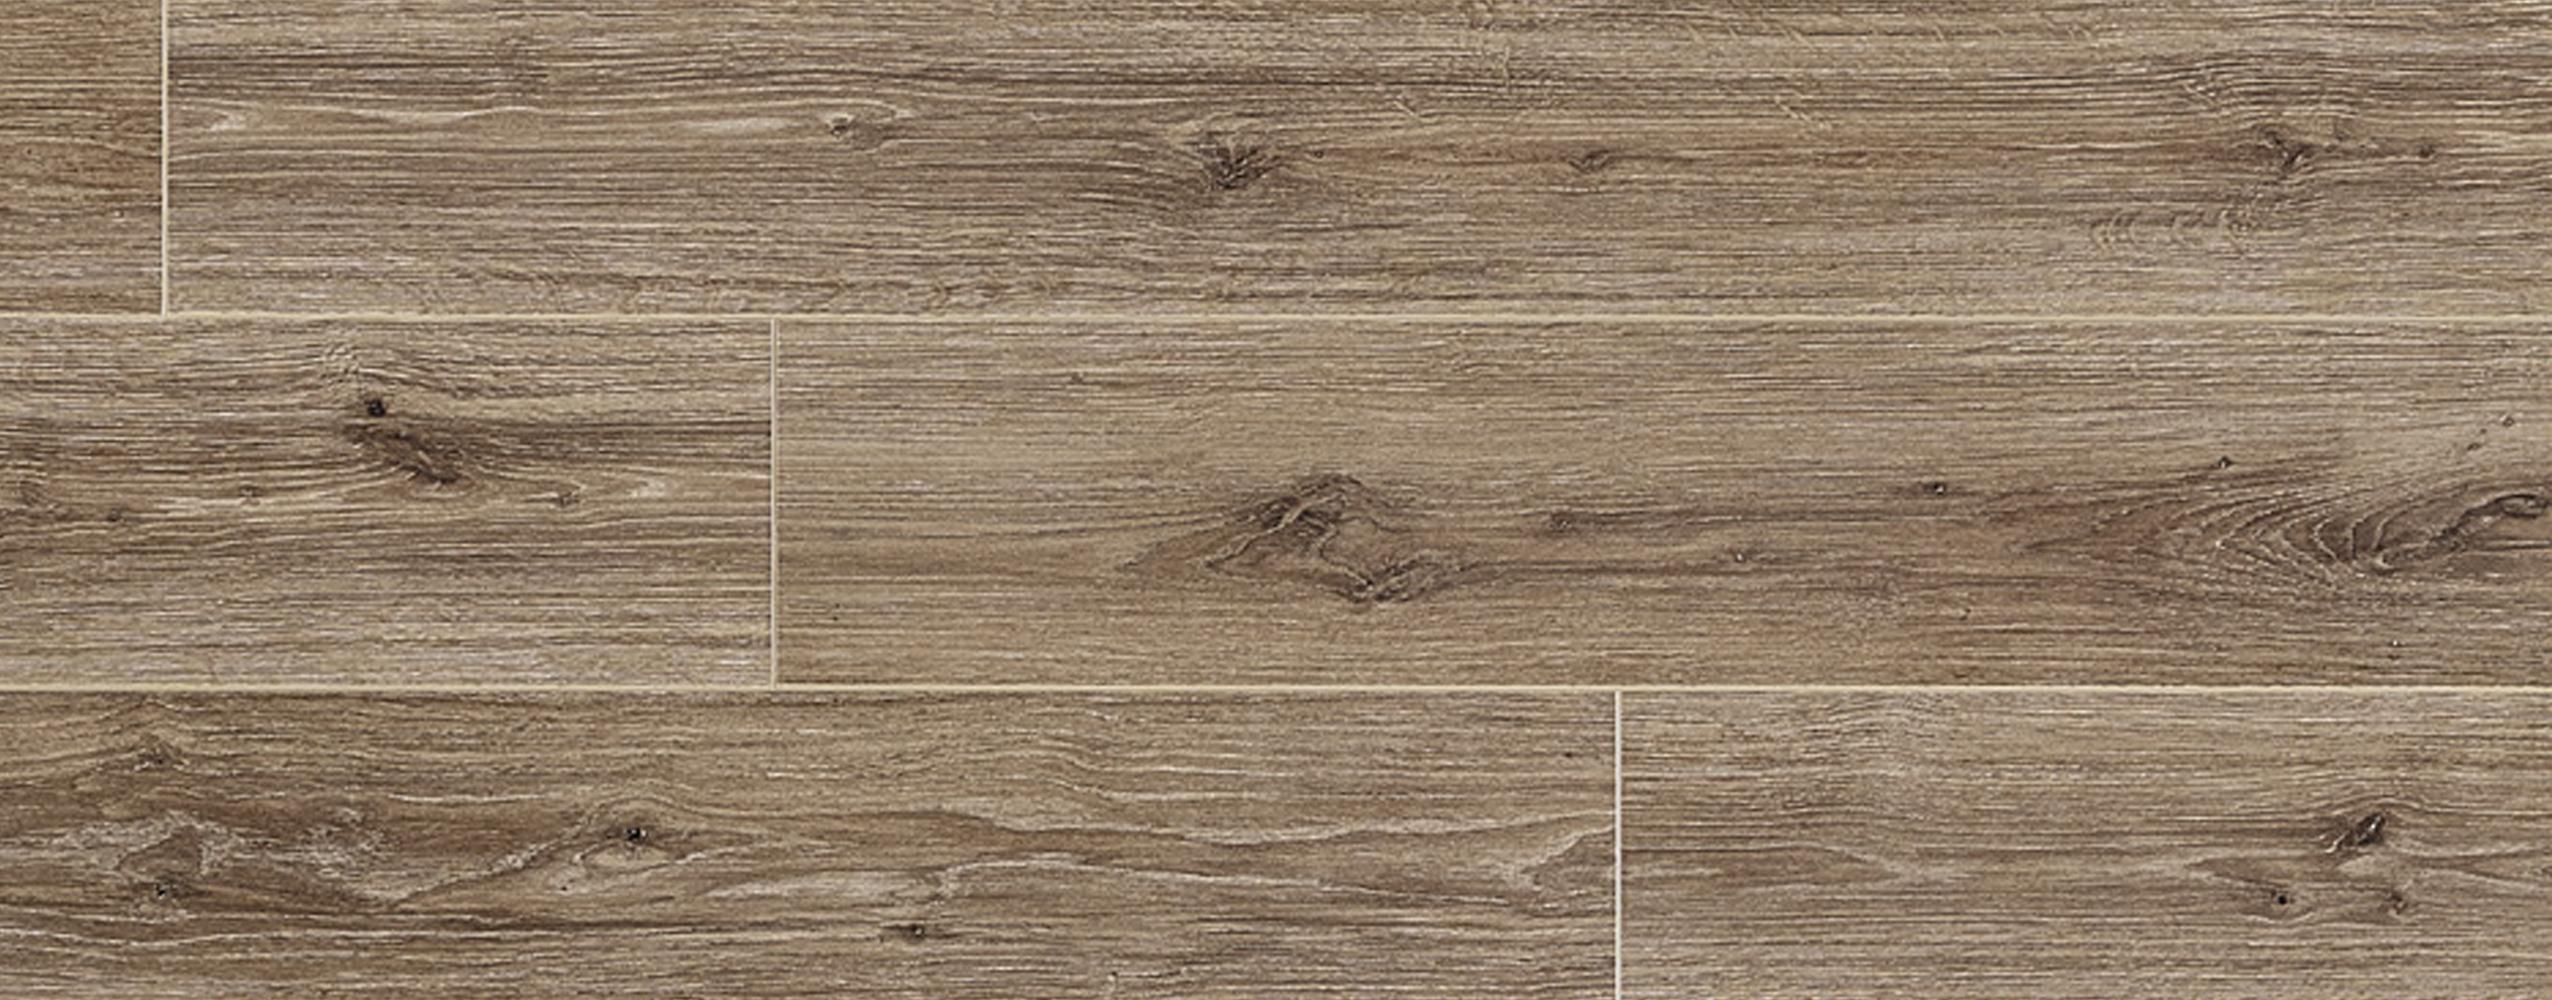 parket laminaat your floor pro laminaat